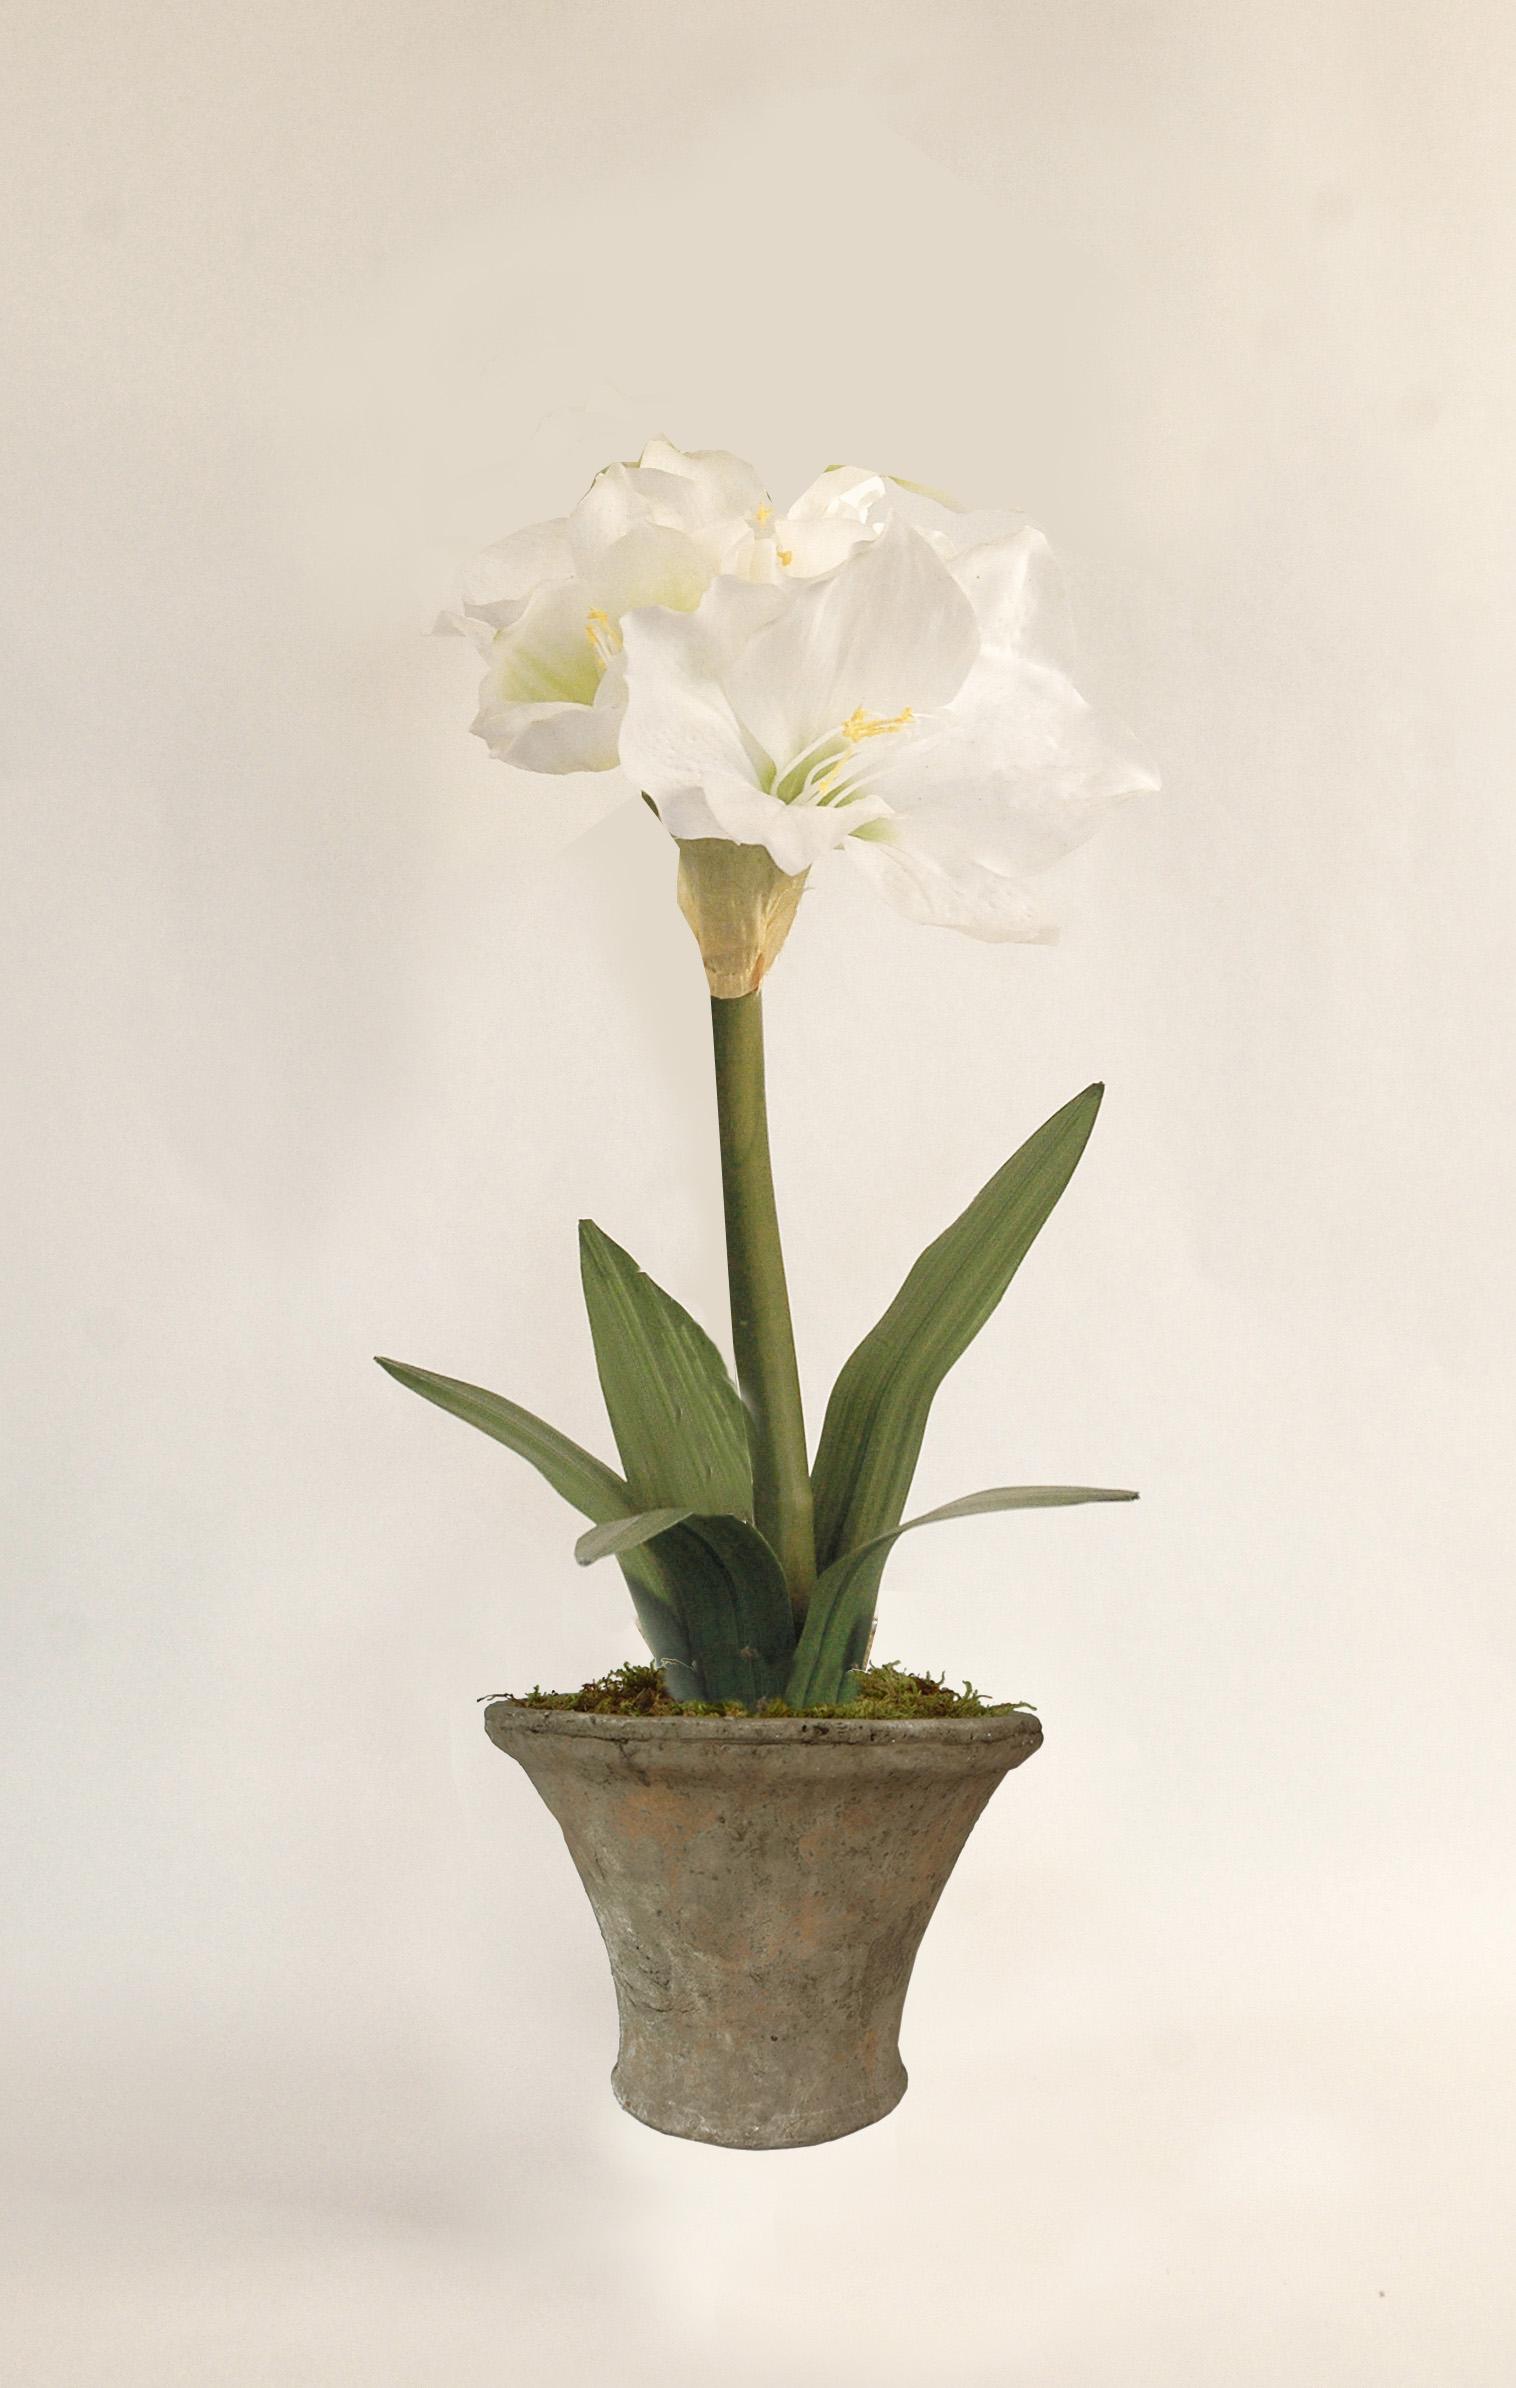 Rebecca Silk Flowers Artificial Arrangements Pene Dene Flowers